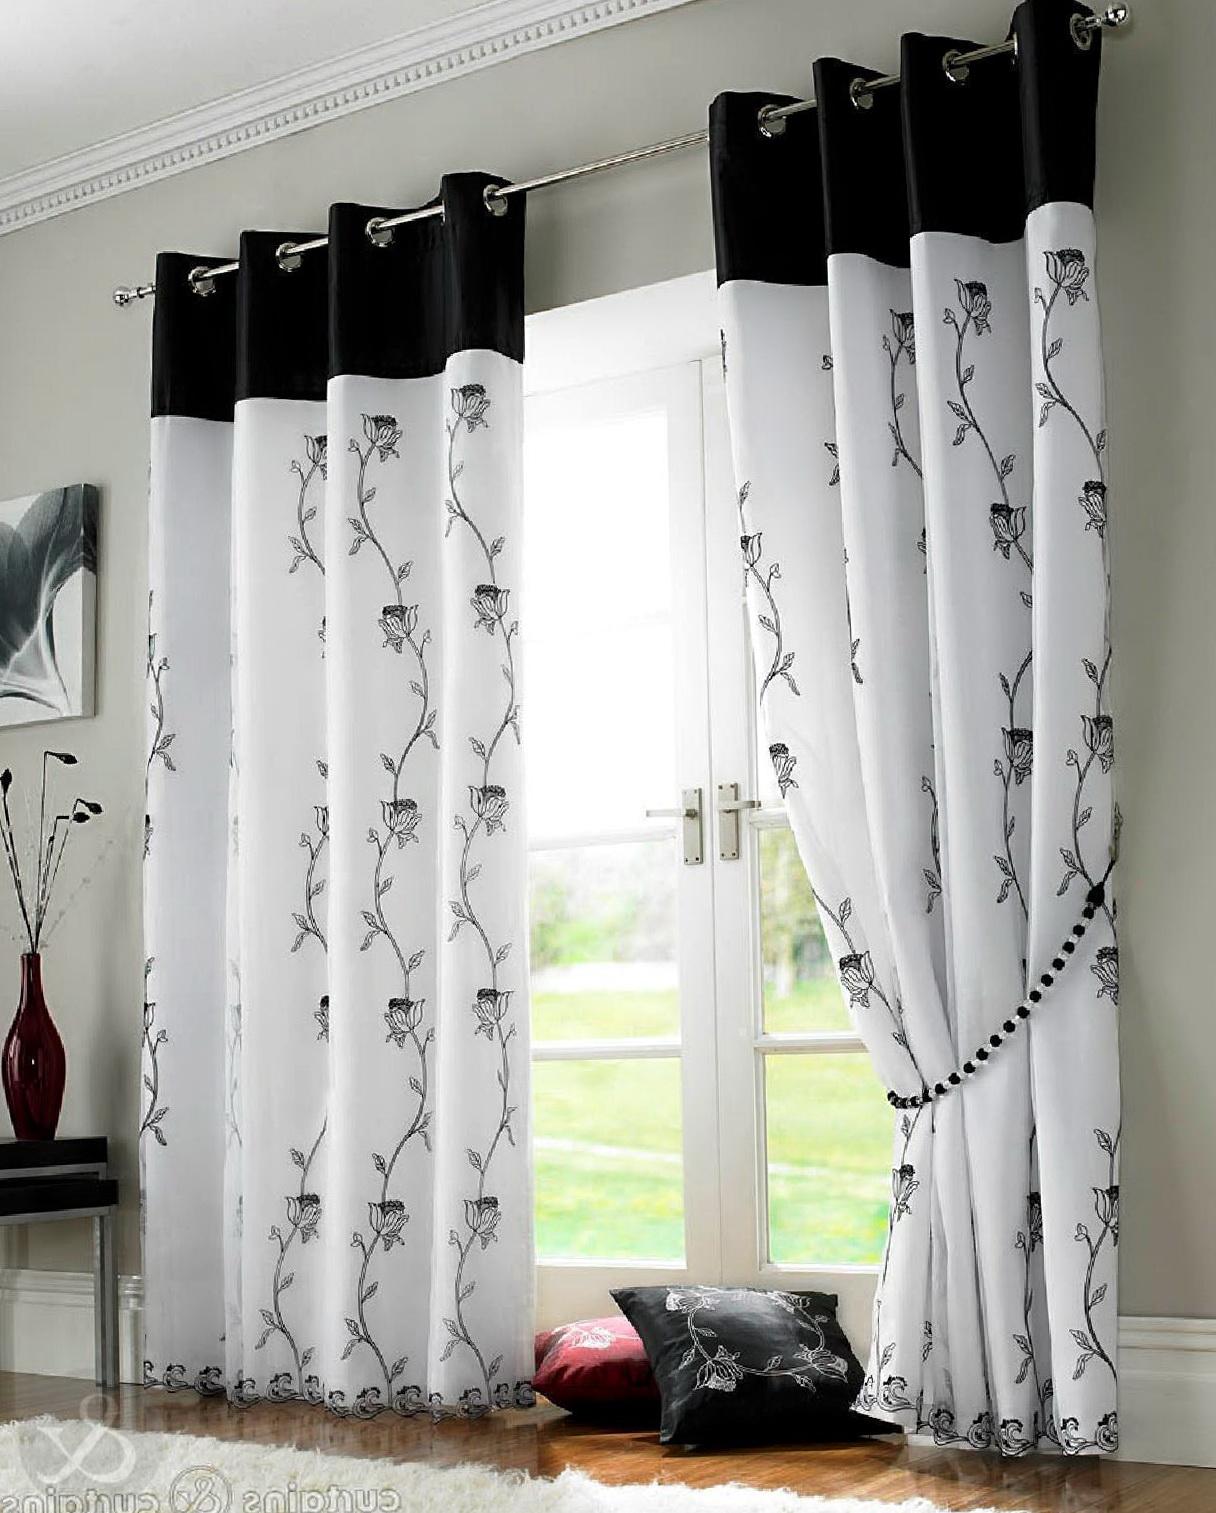 Black And White Curtains Design Home Design Ideas